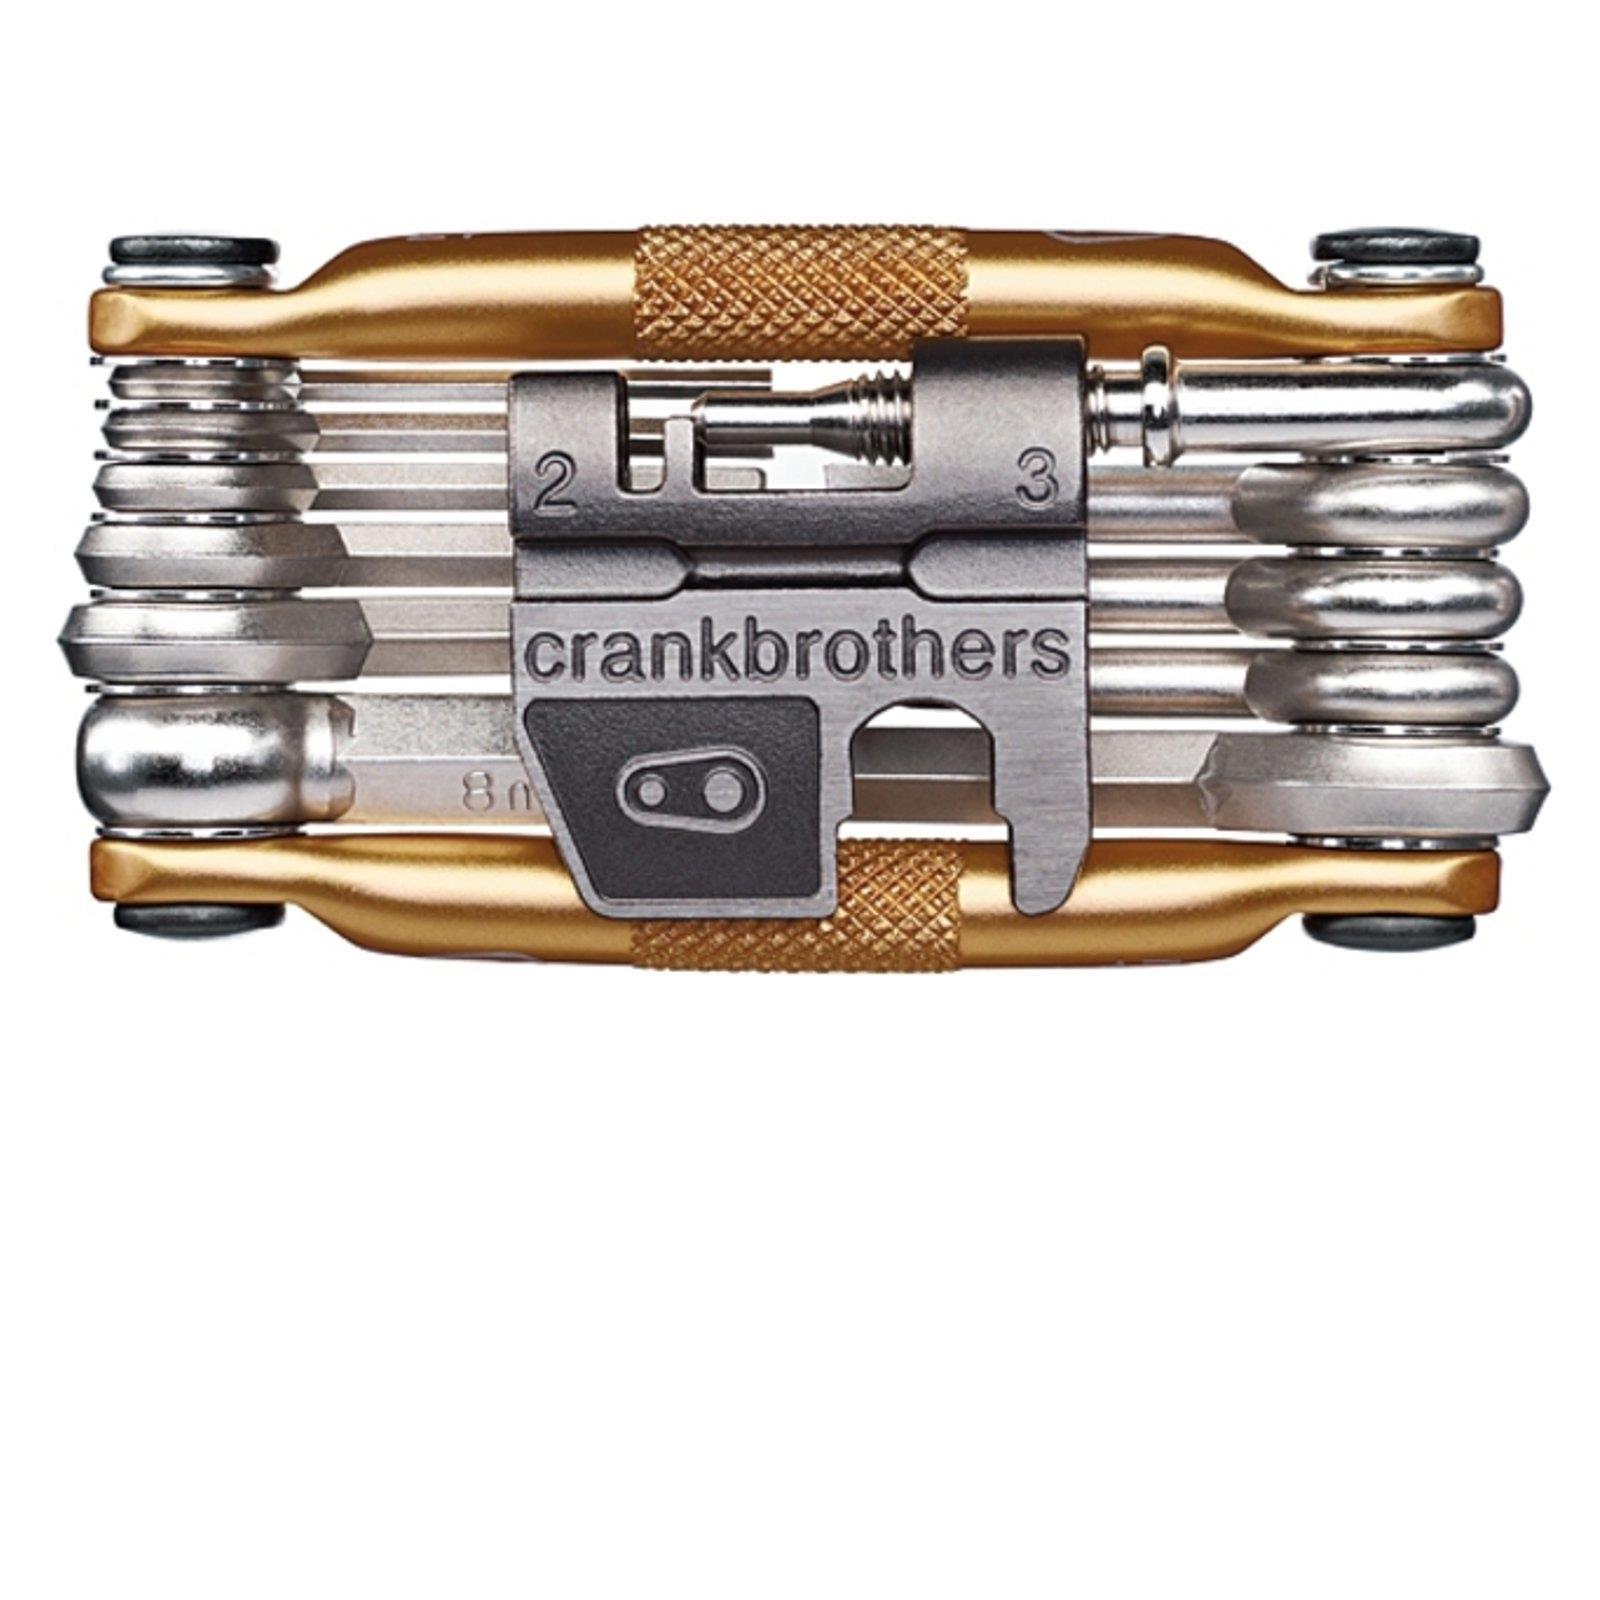 Crankbrothers-herramienta-multifuncional-17-pzas-multi-herramienta-bicicleta-herramienta-multi miniatura 5